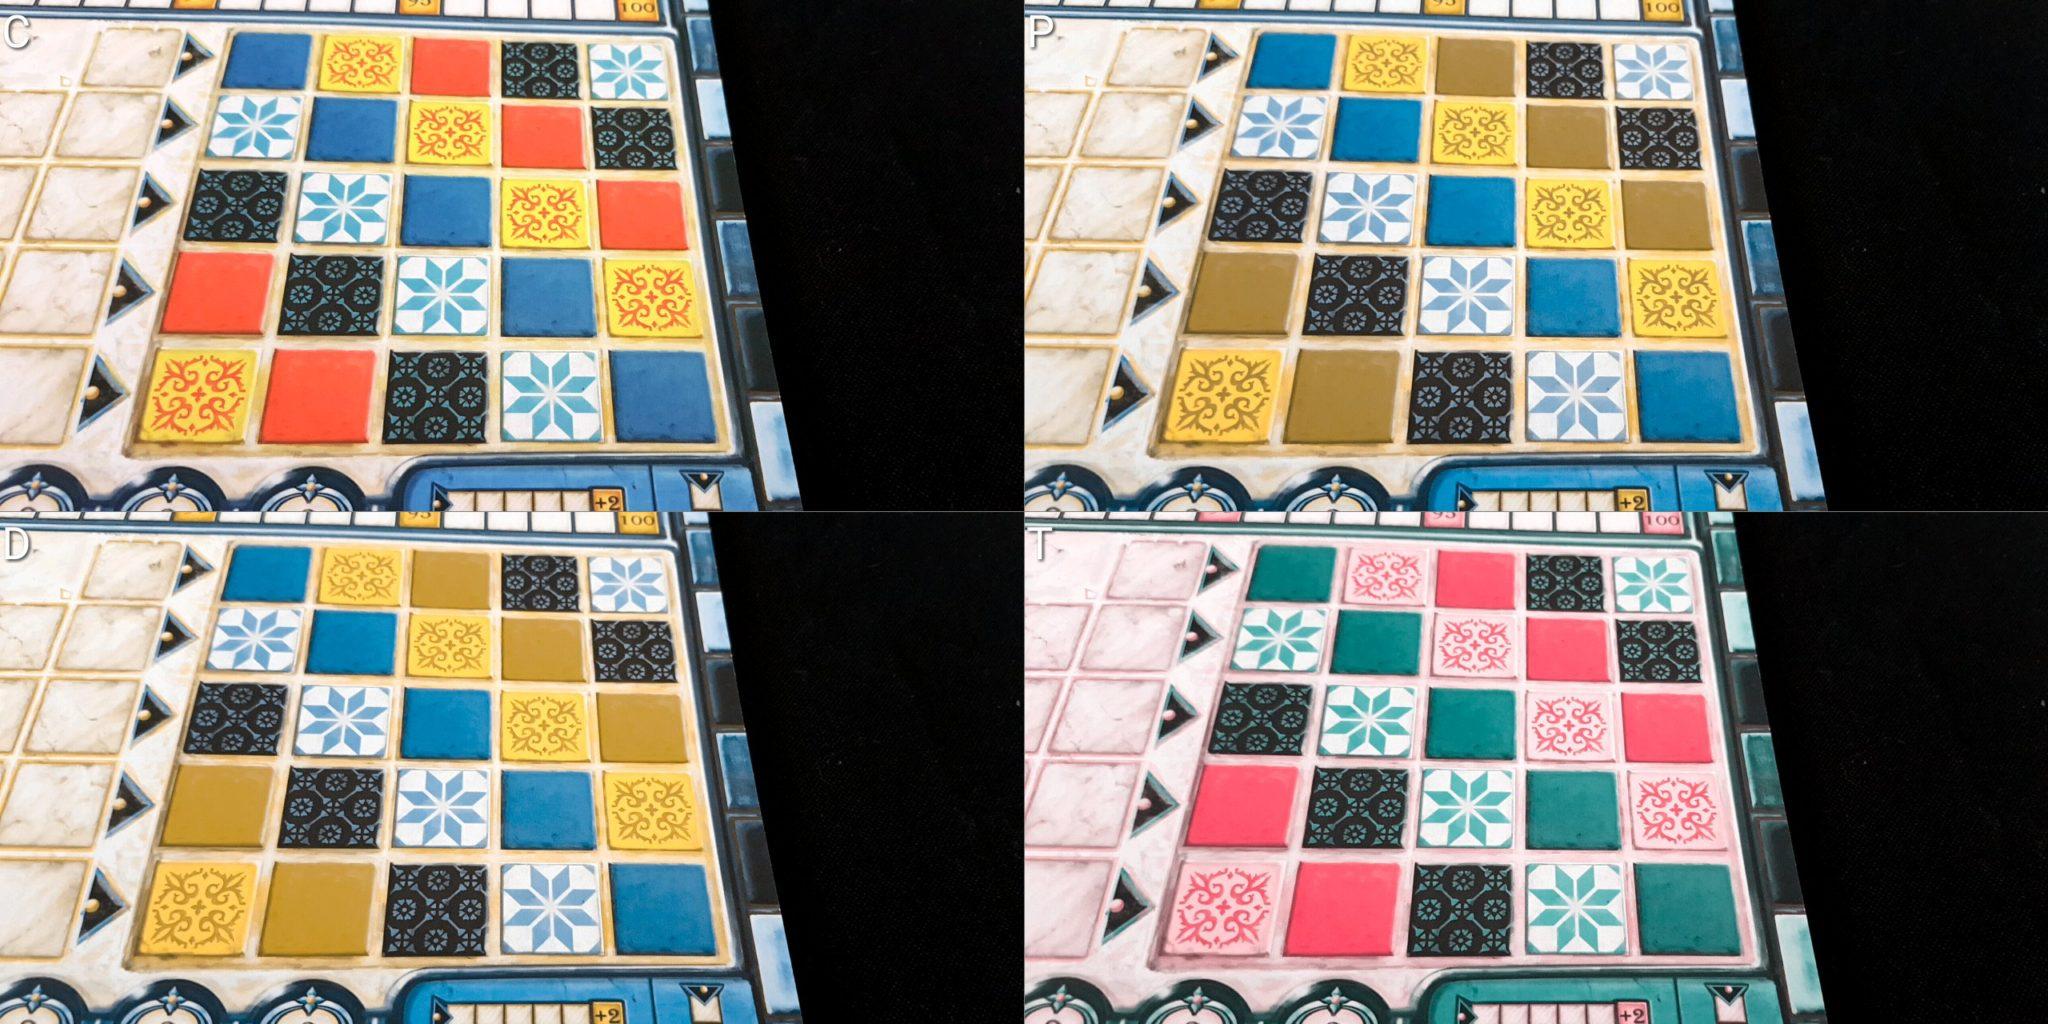 Colour blindness board